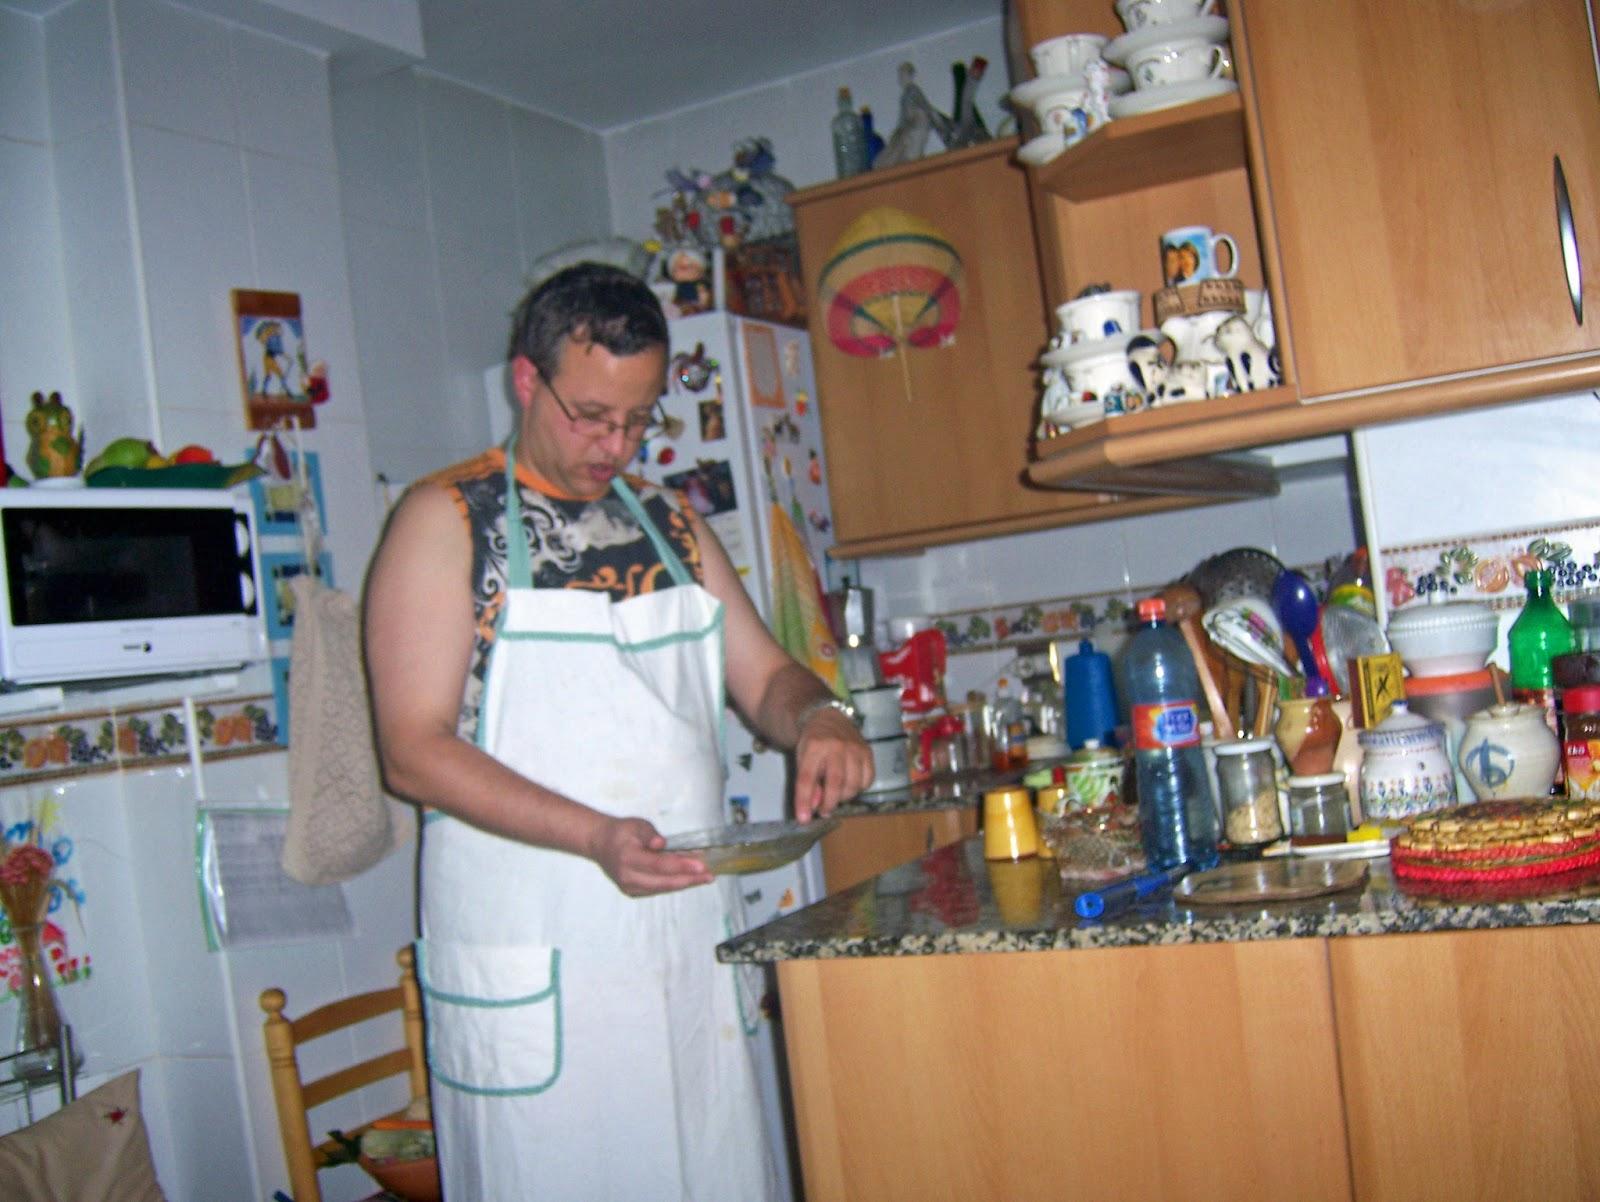 Ba l de noticias bagul de not cies las labores del for Cosas de hogar